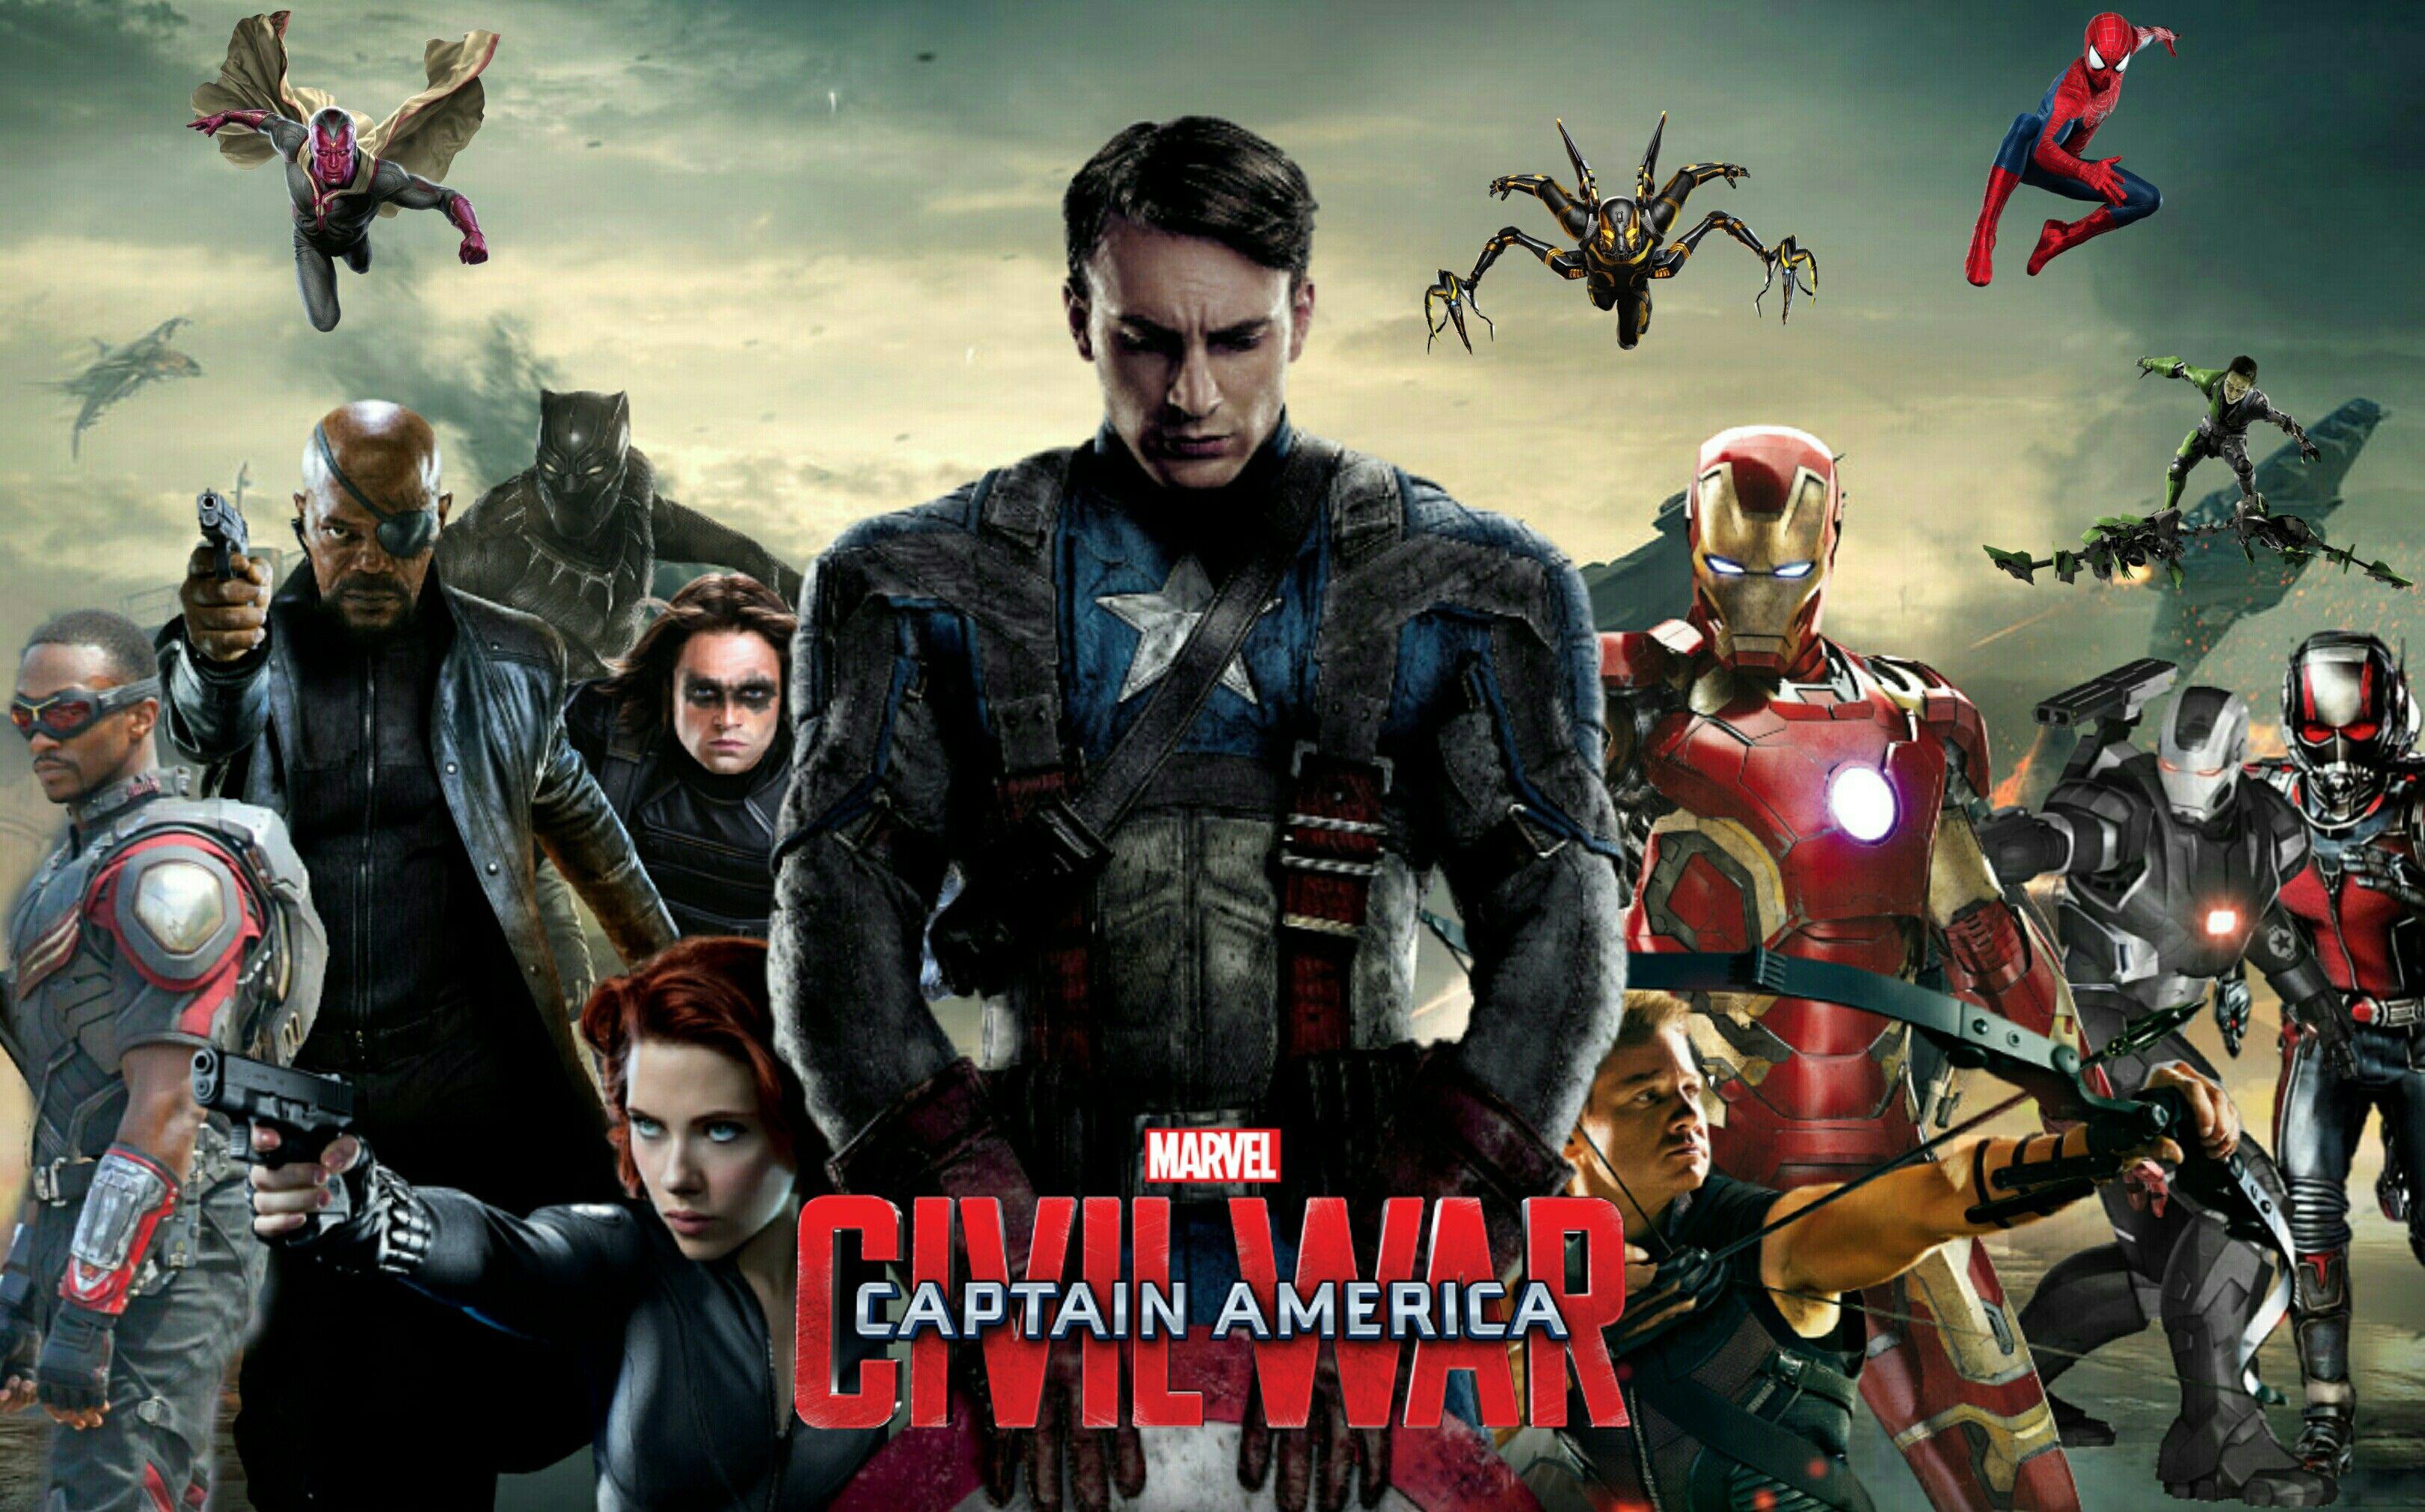 Wonderful Wallpaper Movie Captain America Civil War - f3cc9aeb7ceba9e8133acb8e7c14b284  Perfect Image Reference_611537.jpg